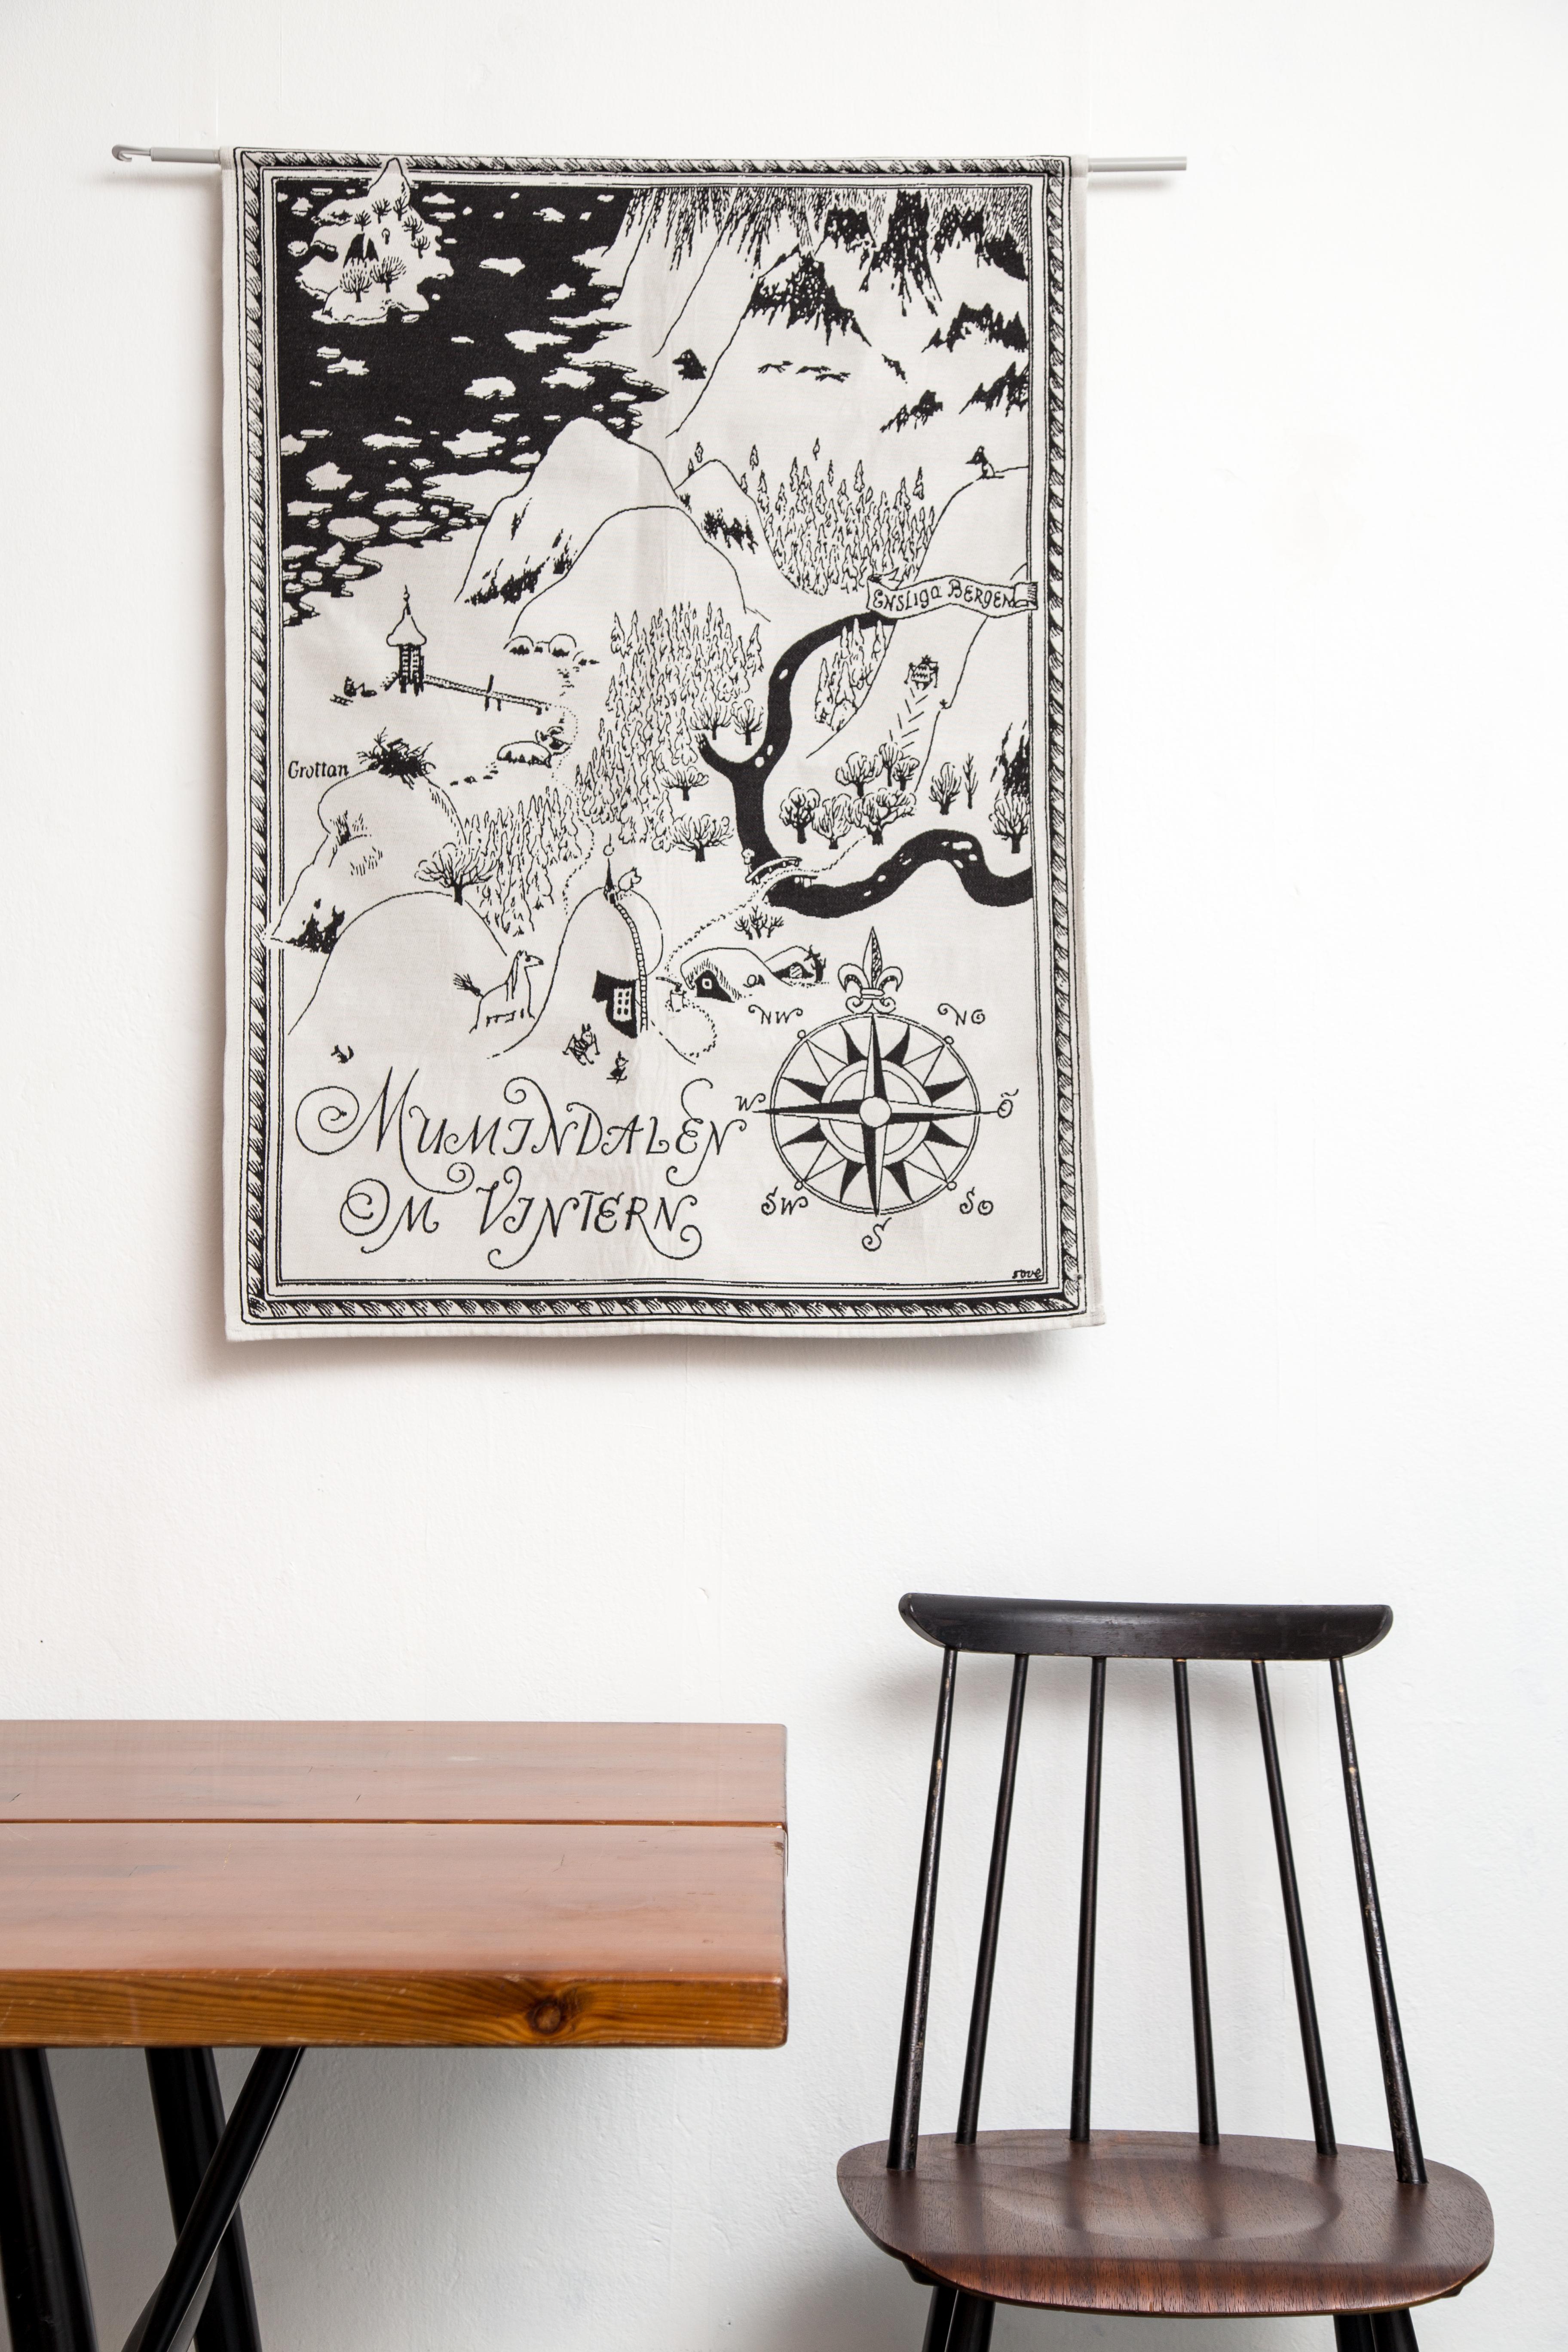 Aurora Decorari Moomin Gobelin Tapestry MUMINDALEN OM VINTERN 114WTM 68 x92cm